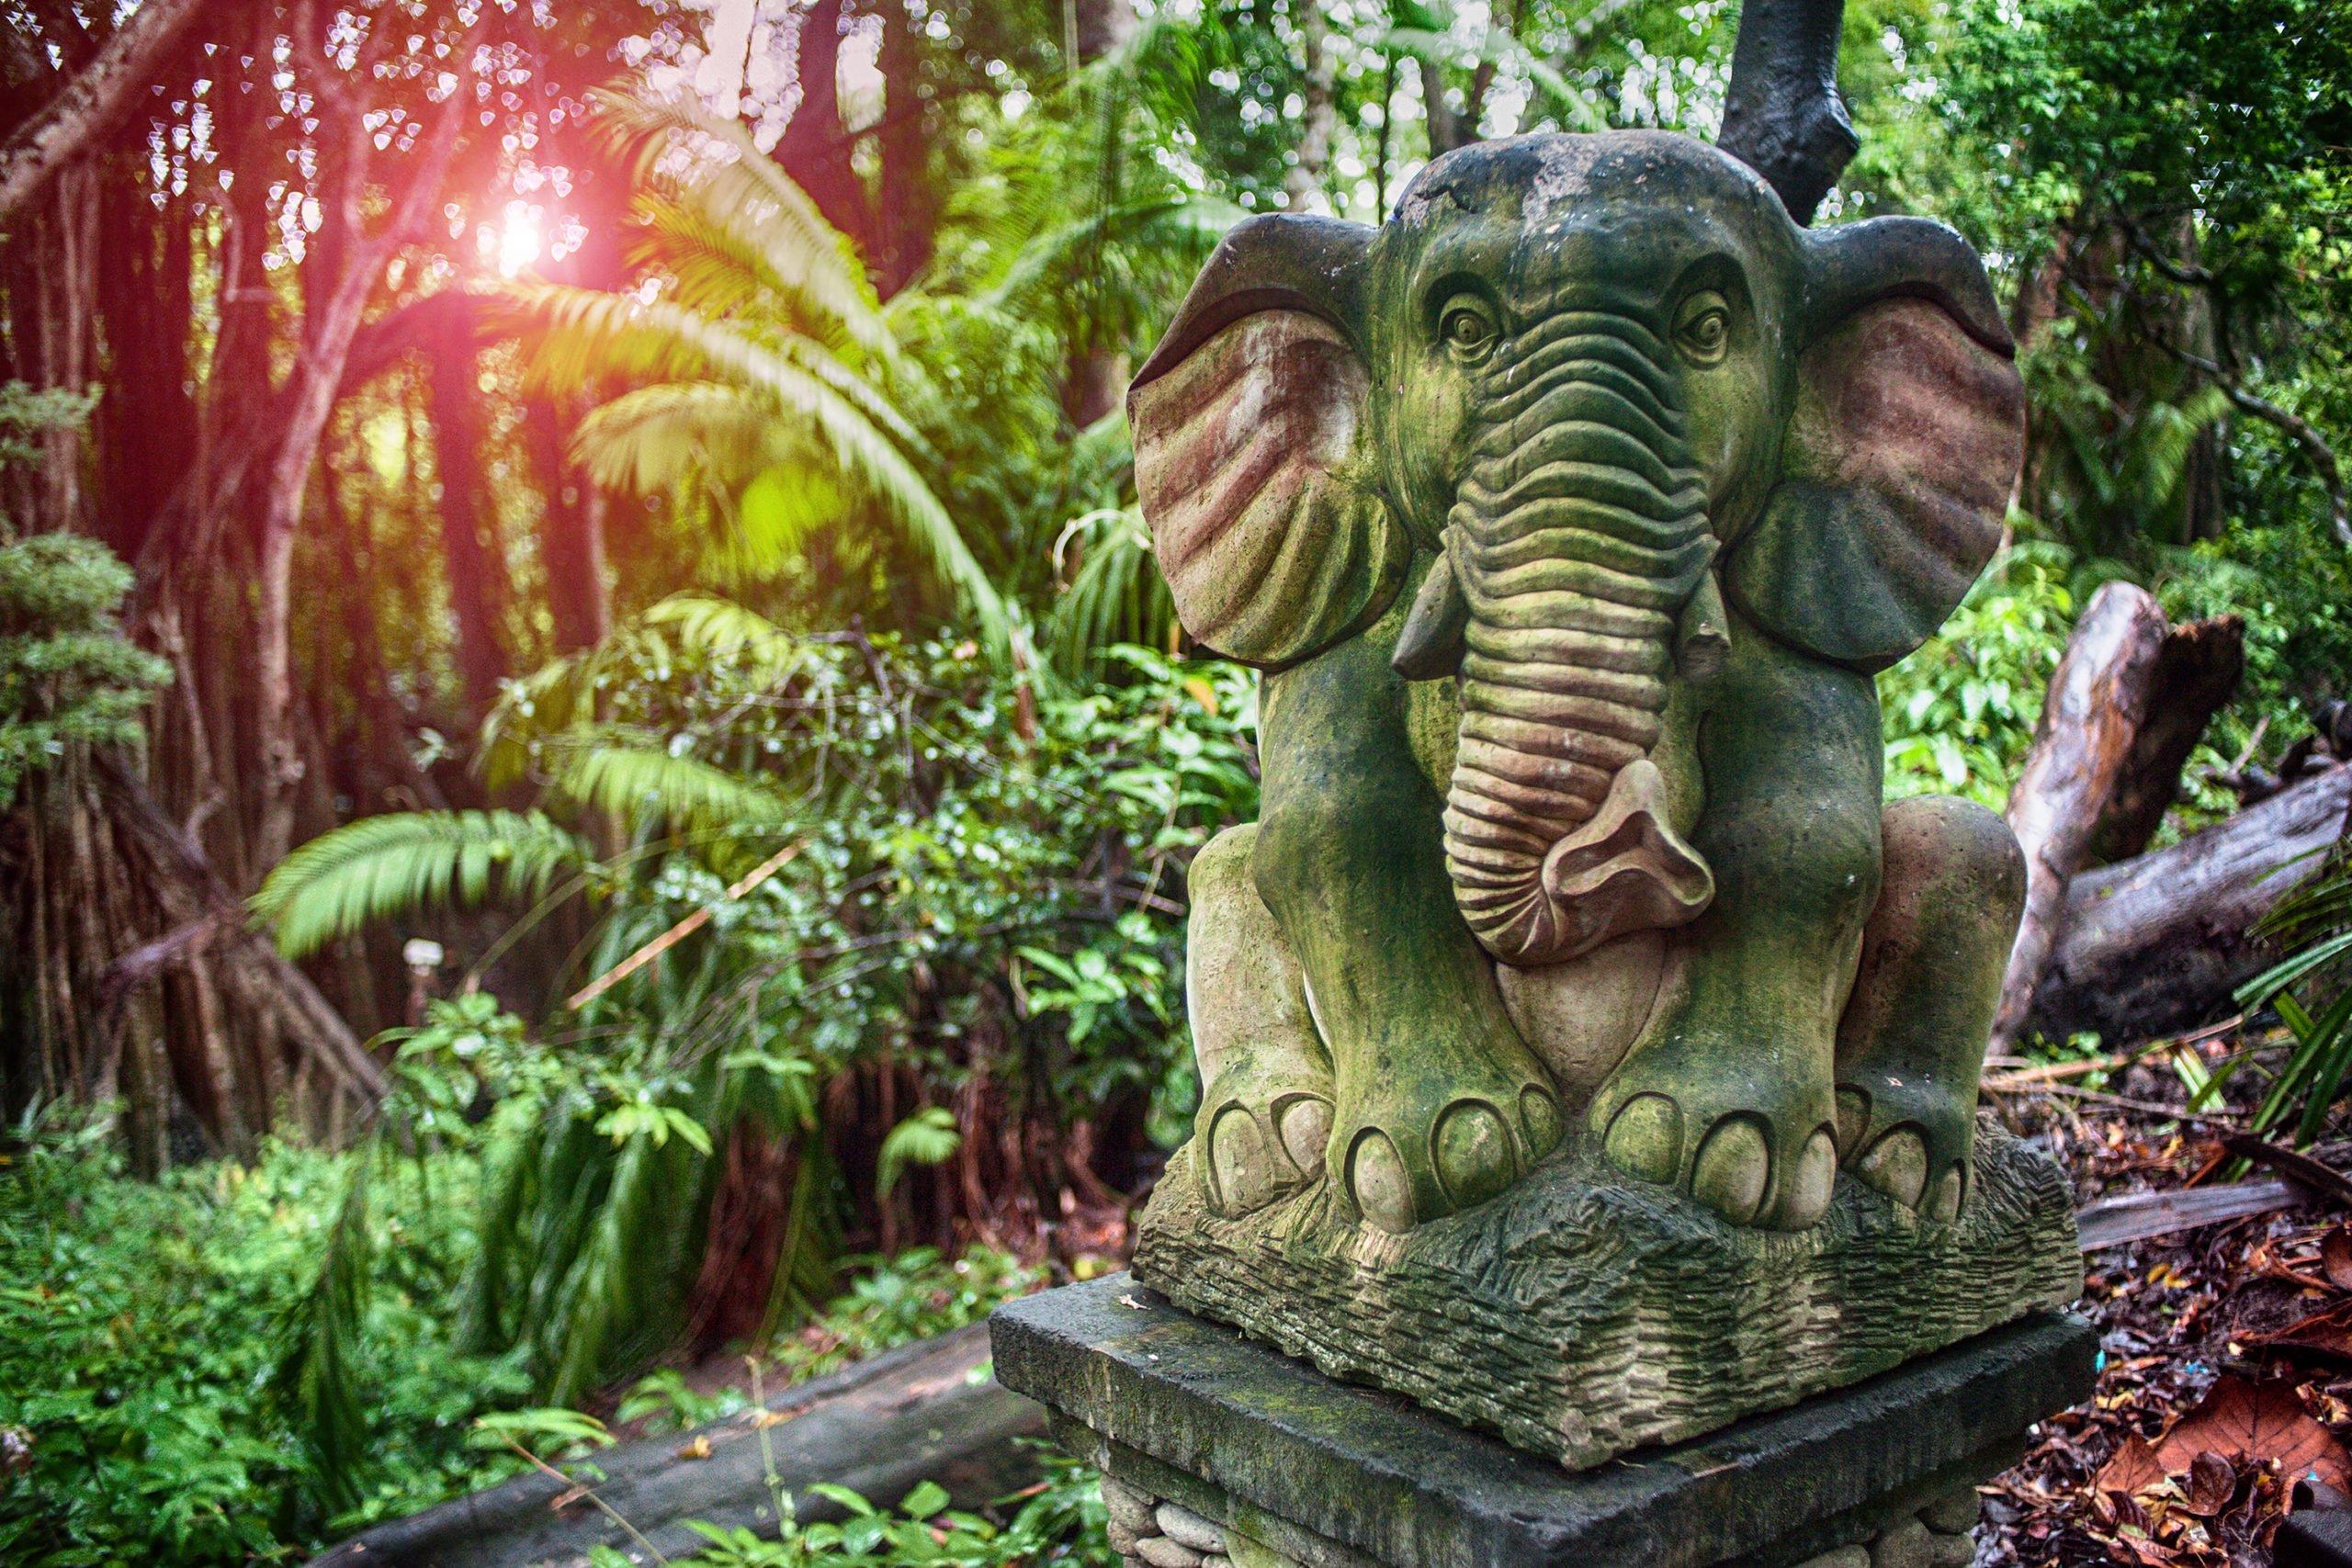 Experience The Famous Monlkey Forest On The Ubud Village And Monkey Forest Half Day Tour From Ubud, Sanur, Kuta, Legian, Nusa Dua, Jimbaram, Uluwatu, Seminyak, Canggu, Denpasar, Gianyar